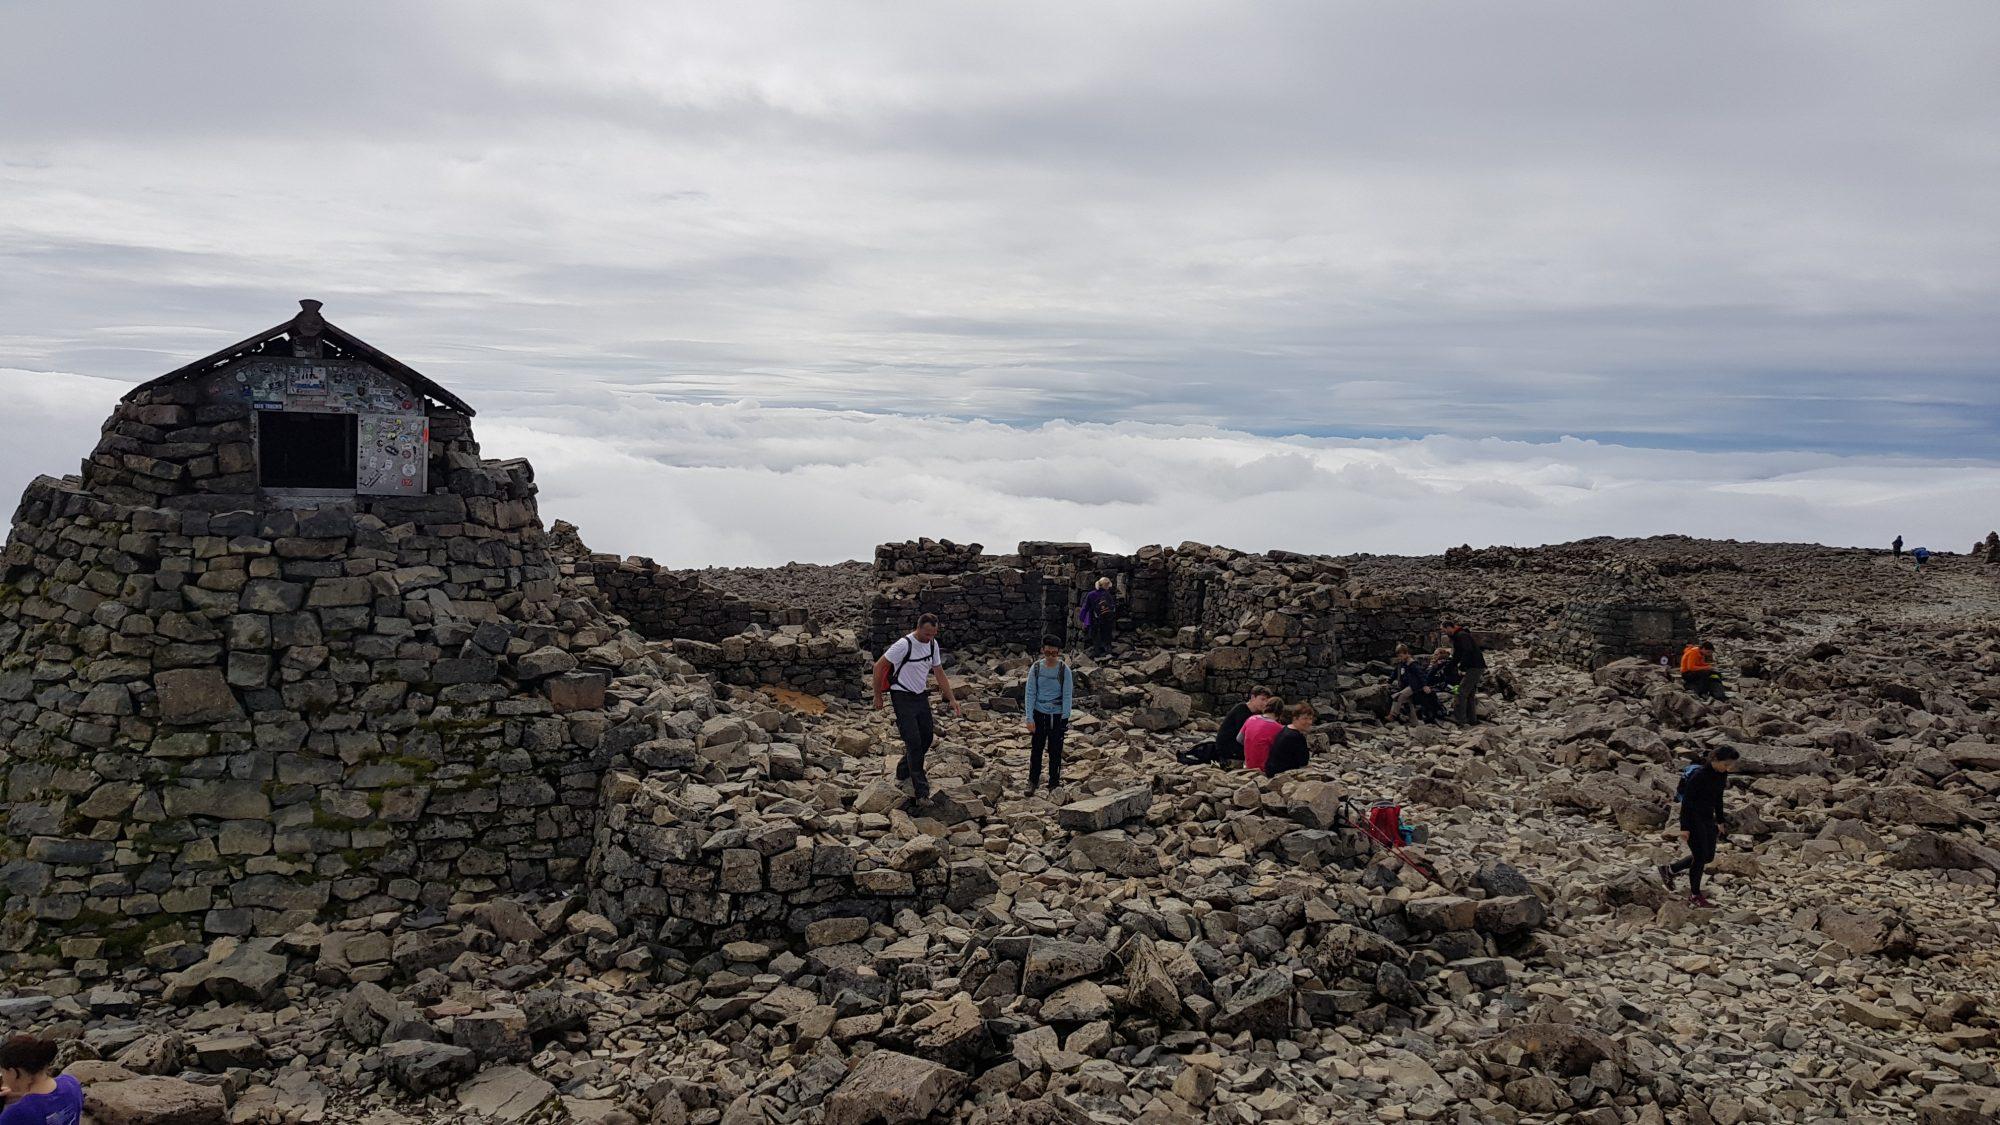 Ben Nevis, Besteigung, Schottland, Wanderung, Highlands